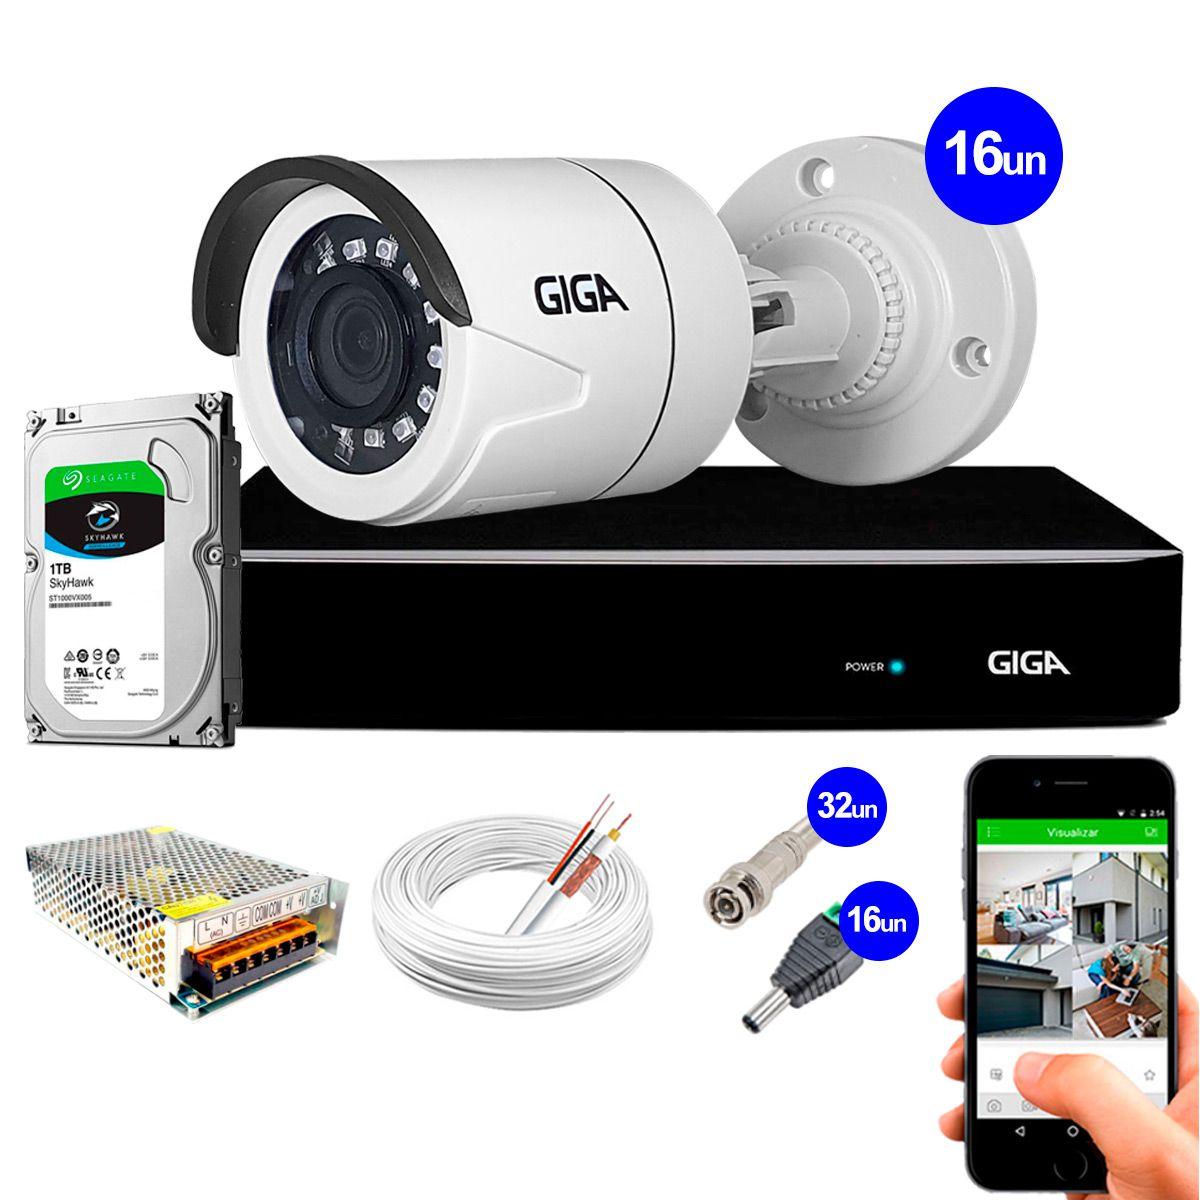 Kit Super Starvis Full HD 1080p 16 Câmeras GS0055 + DVR Giga Security + HD 1TB Skyhawk + Acessórios  - Tudo Forte